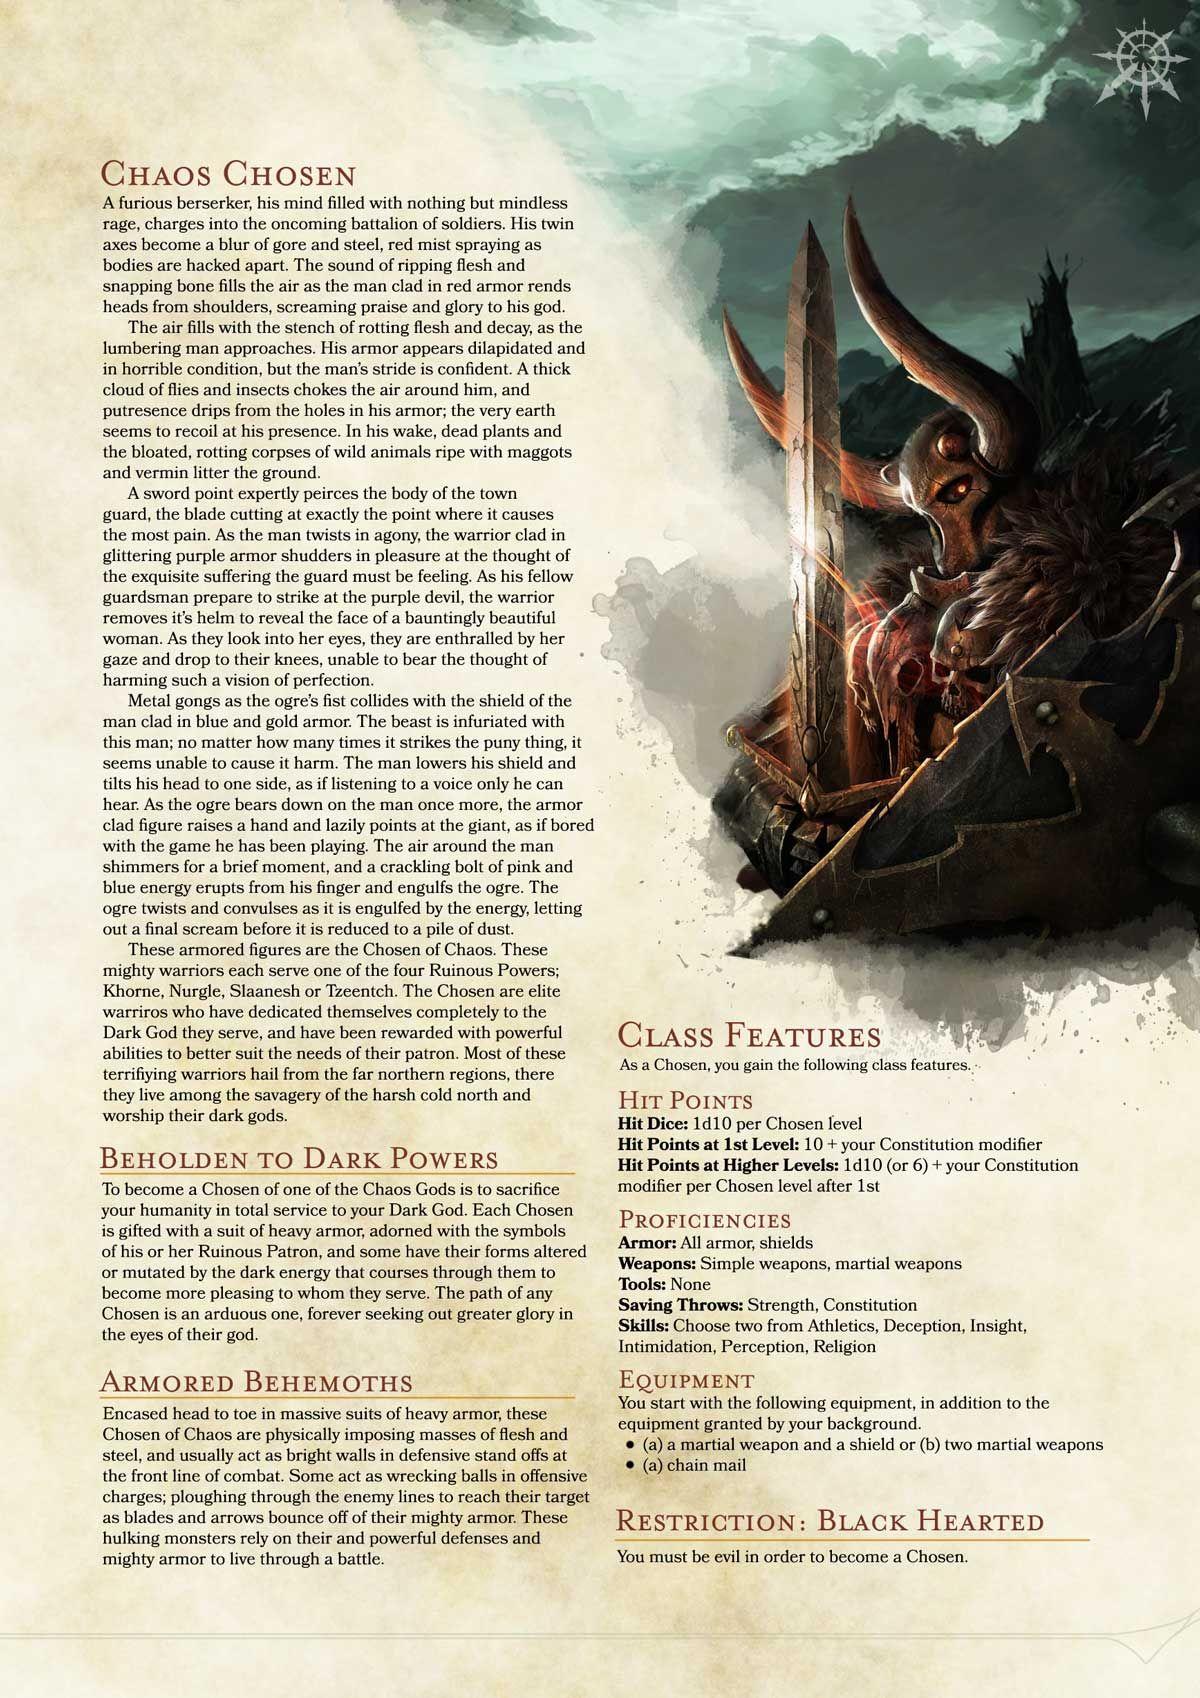 Warhammer Chosen Homebrew 1.5 | Pinterest | Dnd 5e homebrew, RPG and ...